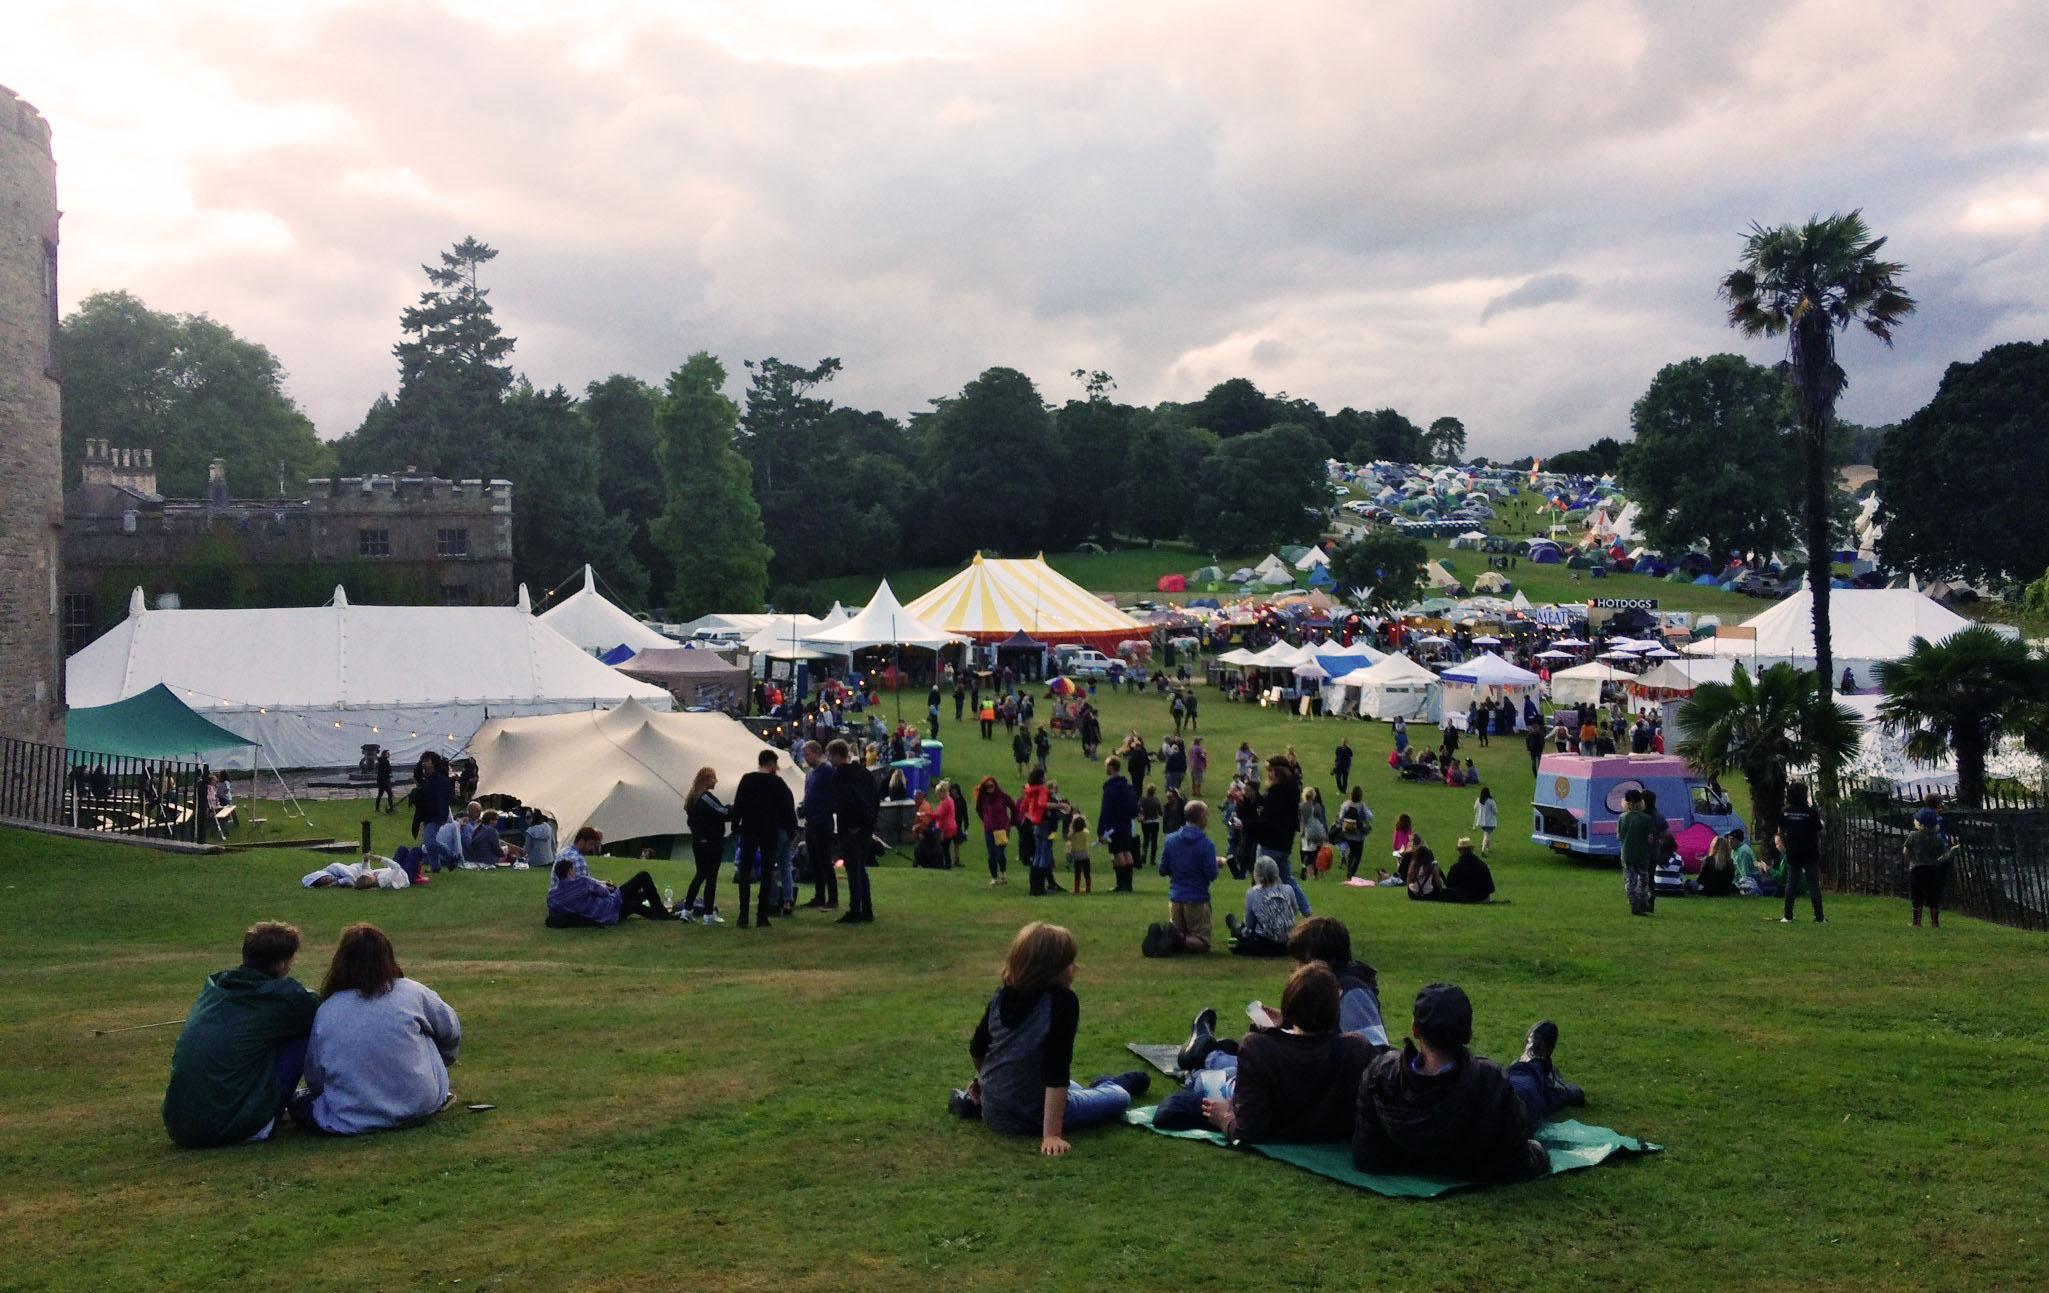 port Eliot festival 2017 - the calm before the storm